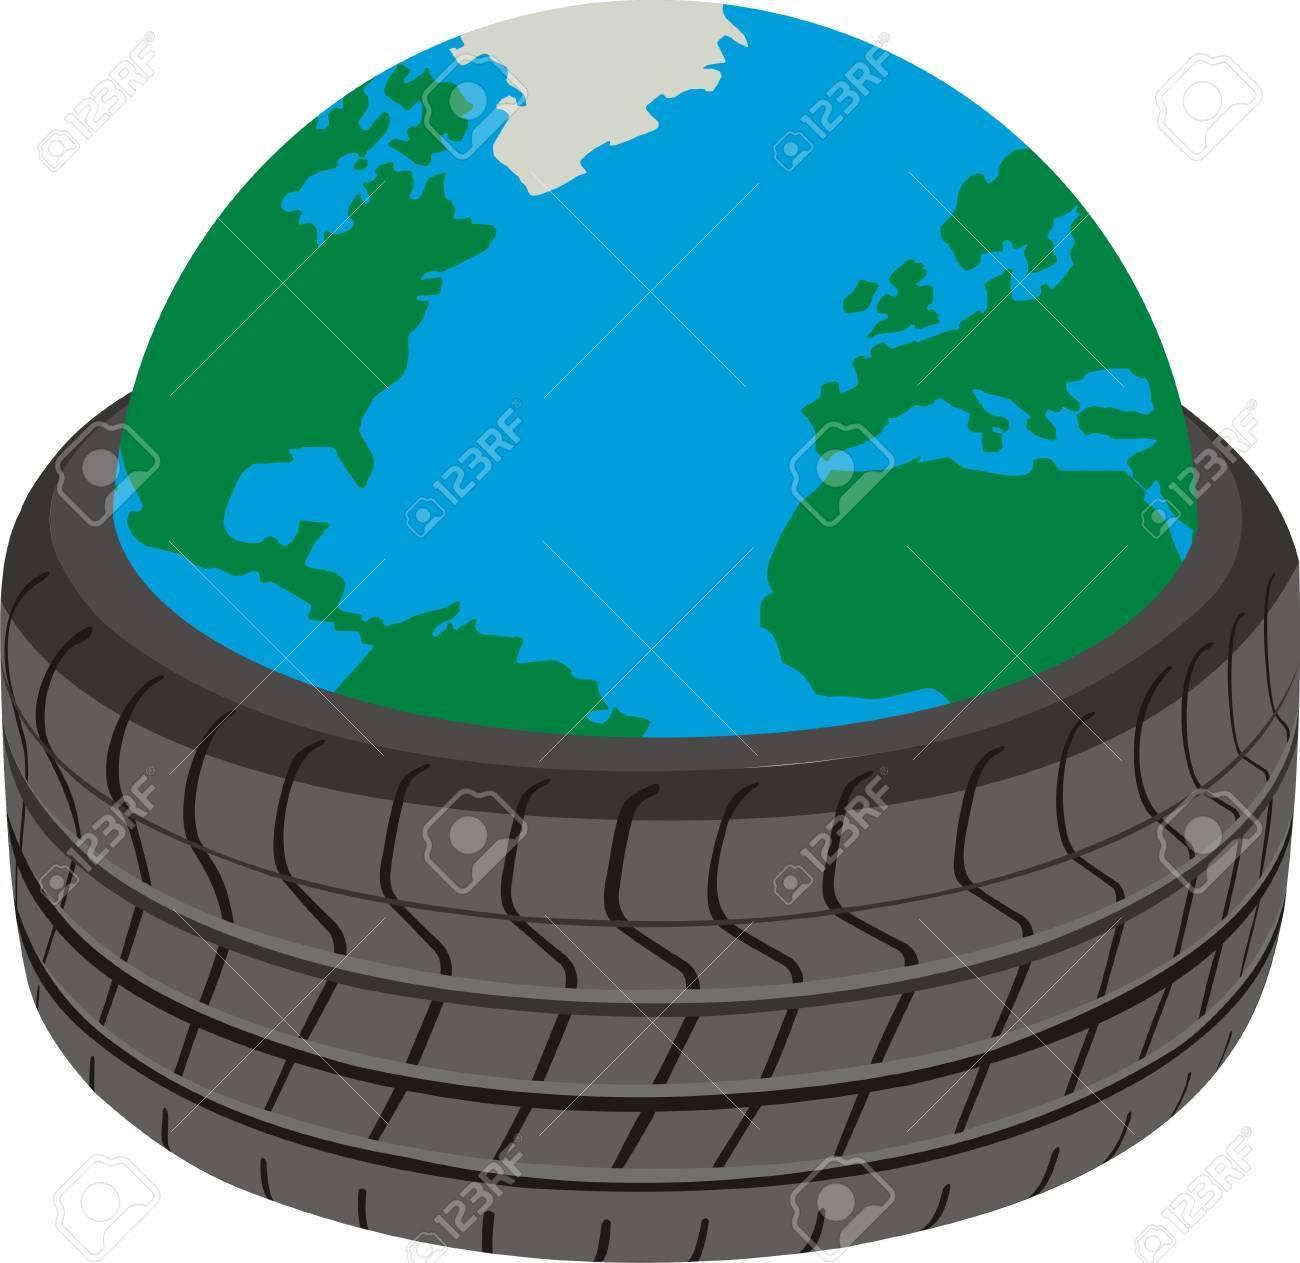 Planet of wheels Stock Vector - 11376146